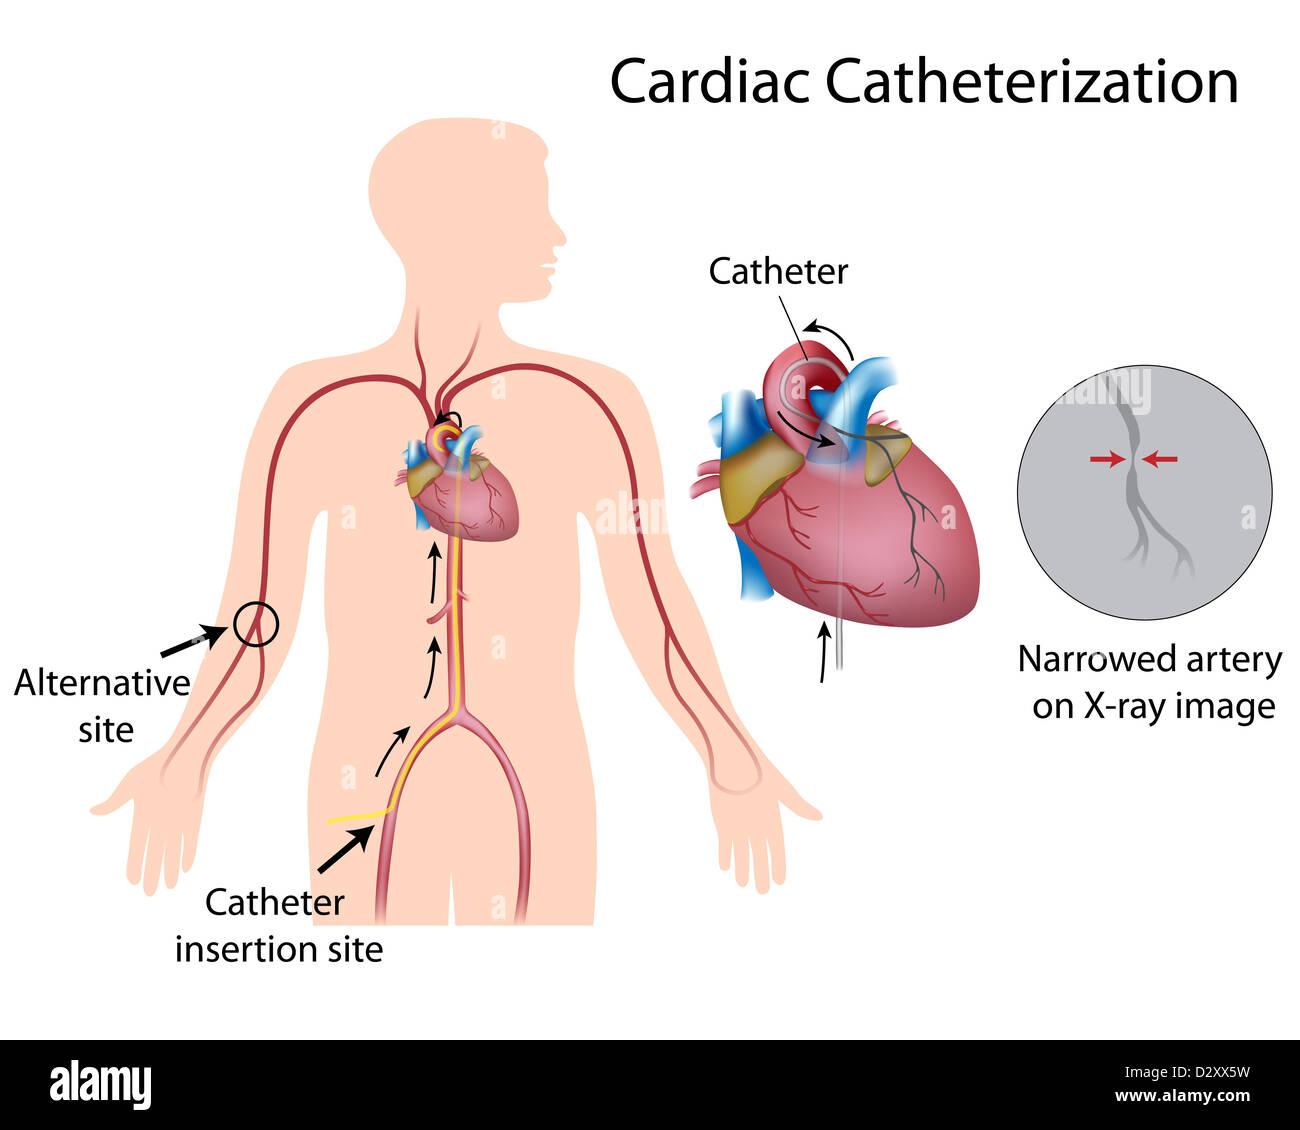 Cardiac catheterization Stock Photo: 53451717 - Alamy